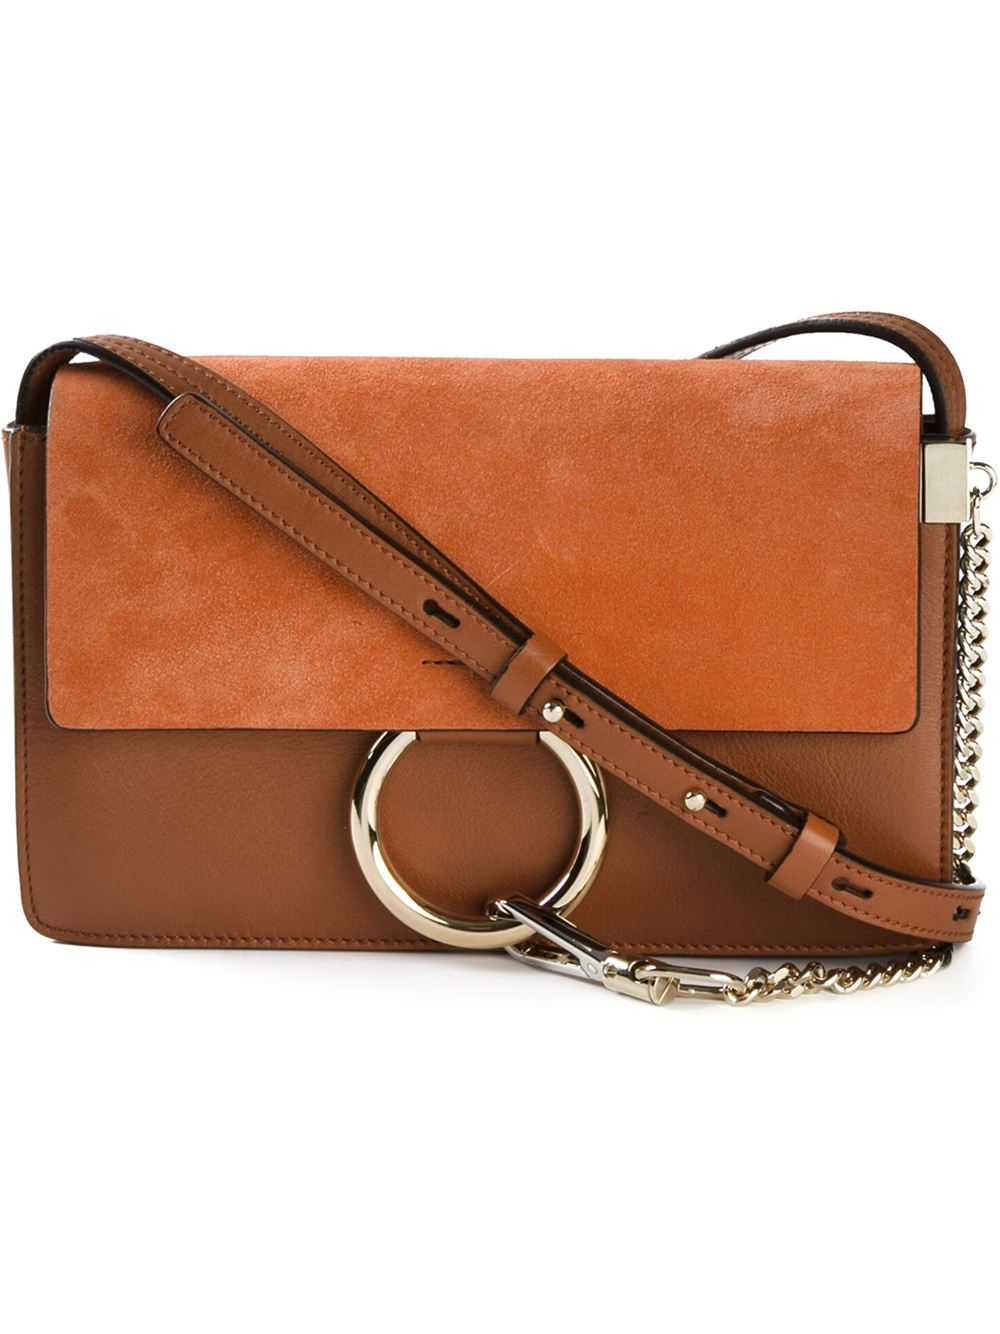 Lyst - Chloé  Faye  Crossbody Bag in Brown 752f092bc8c6